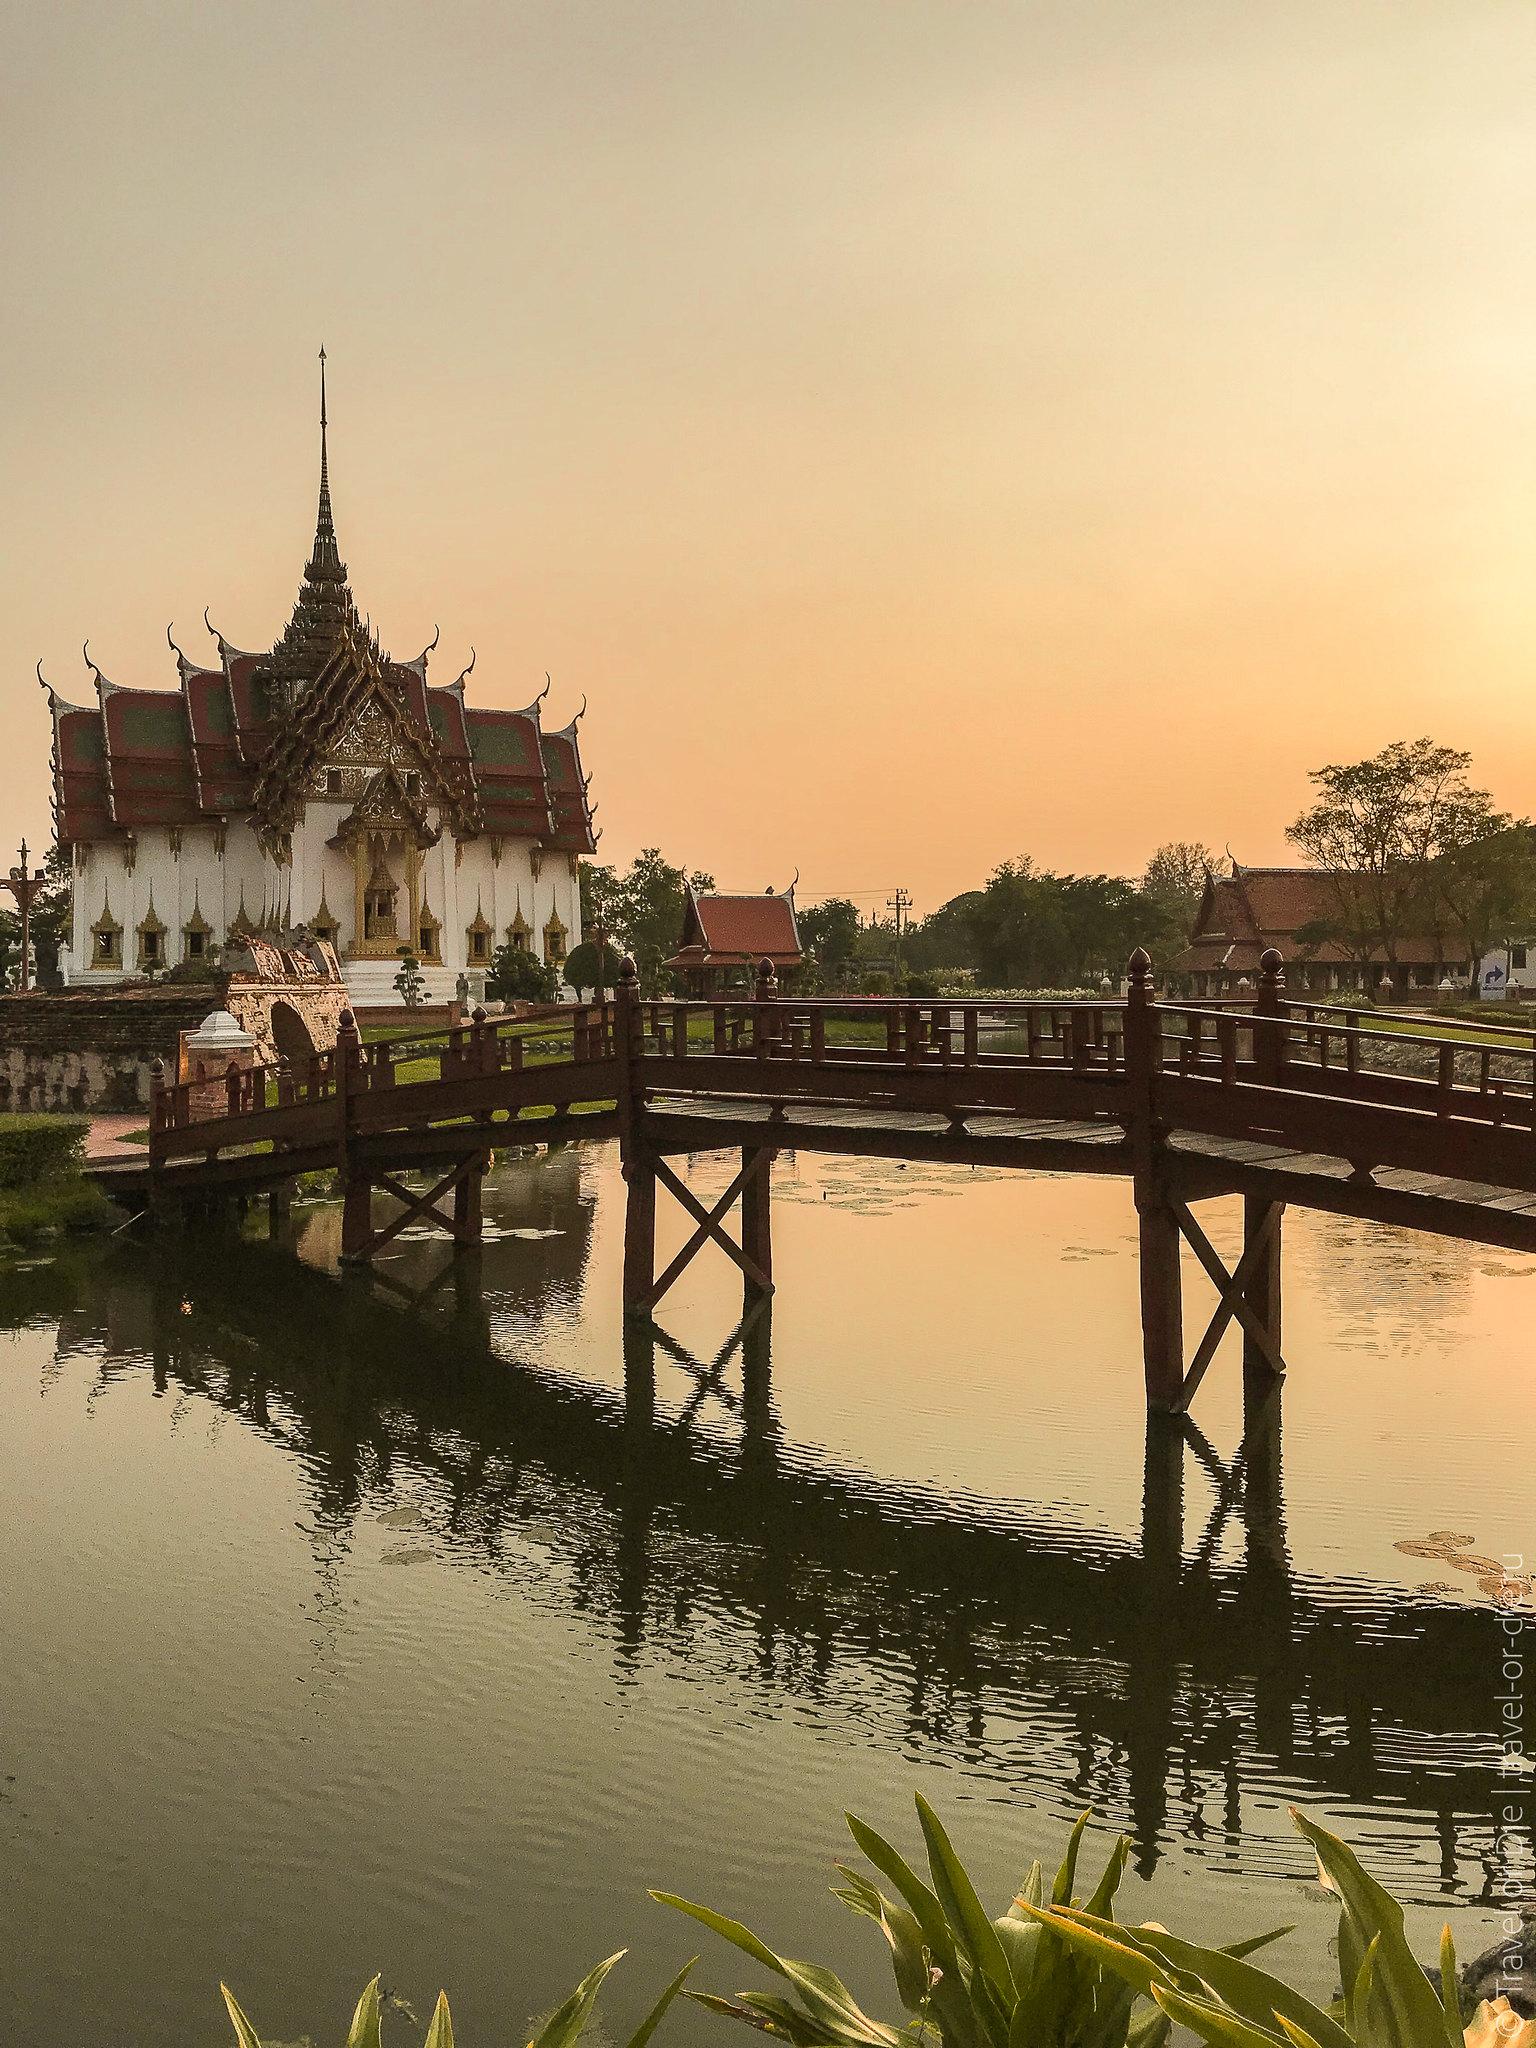 Ancient-City-Muang-Boran-Bangkok-9823